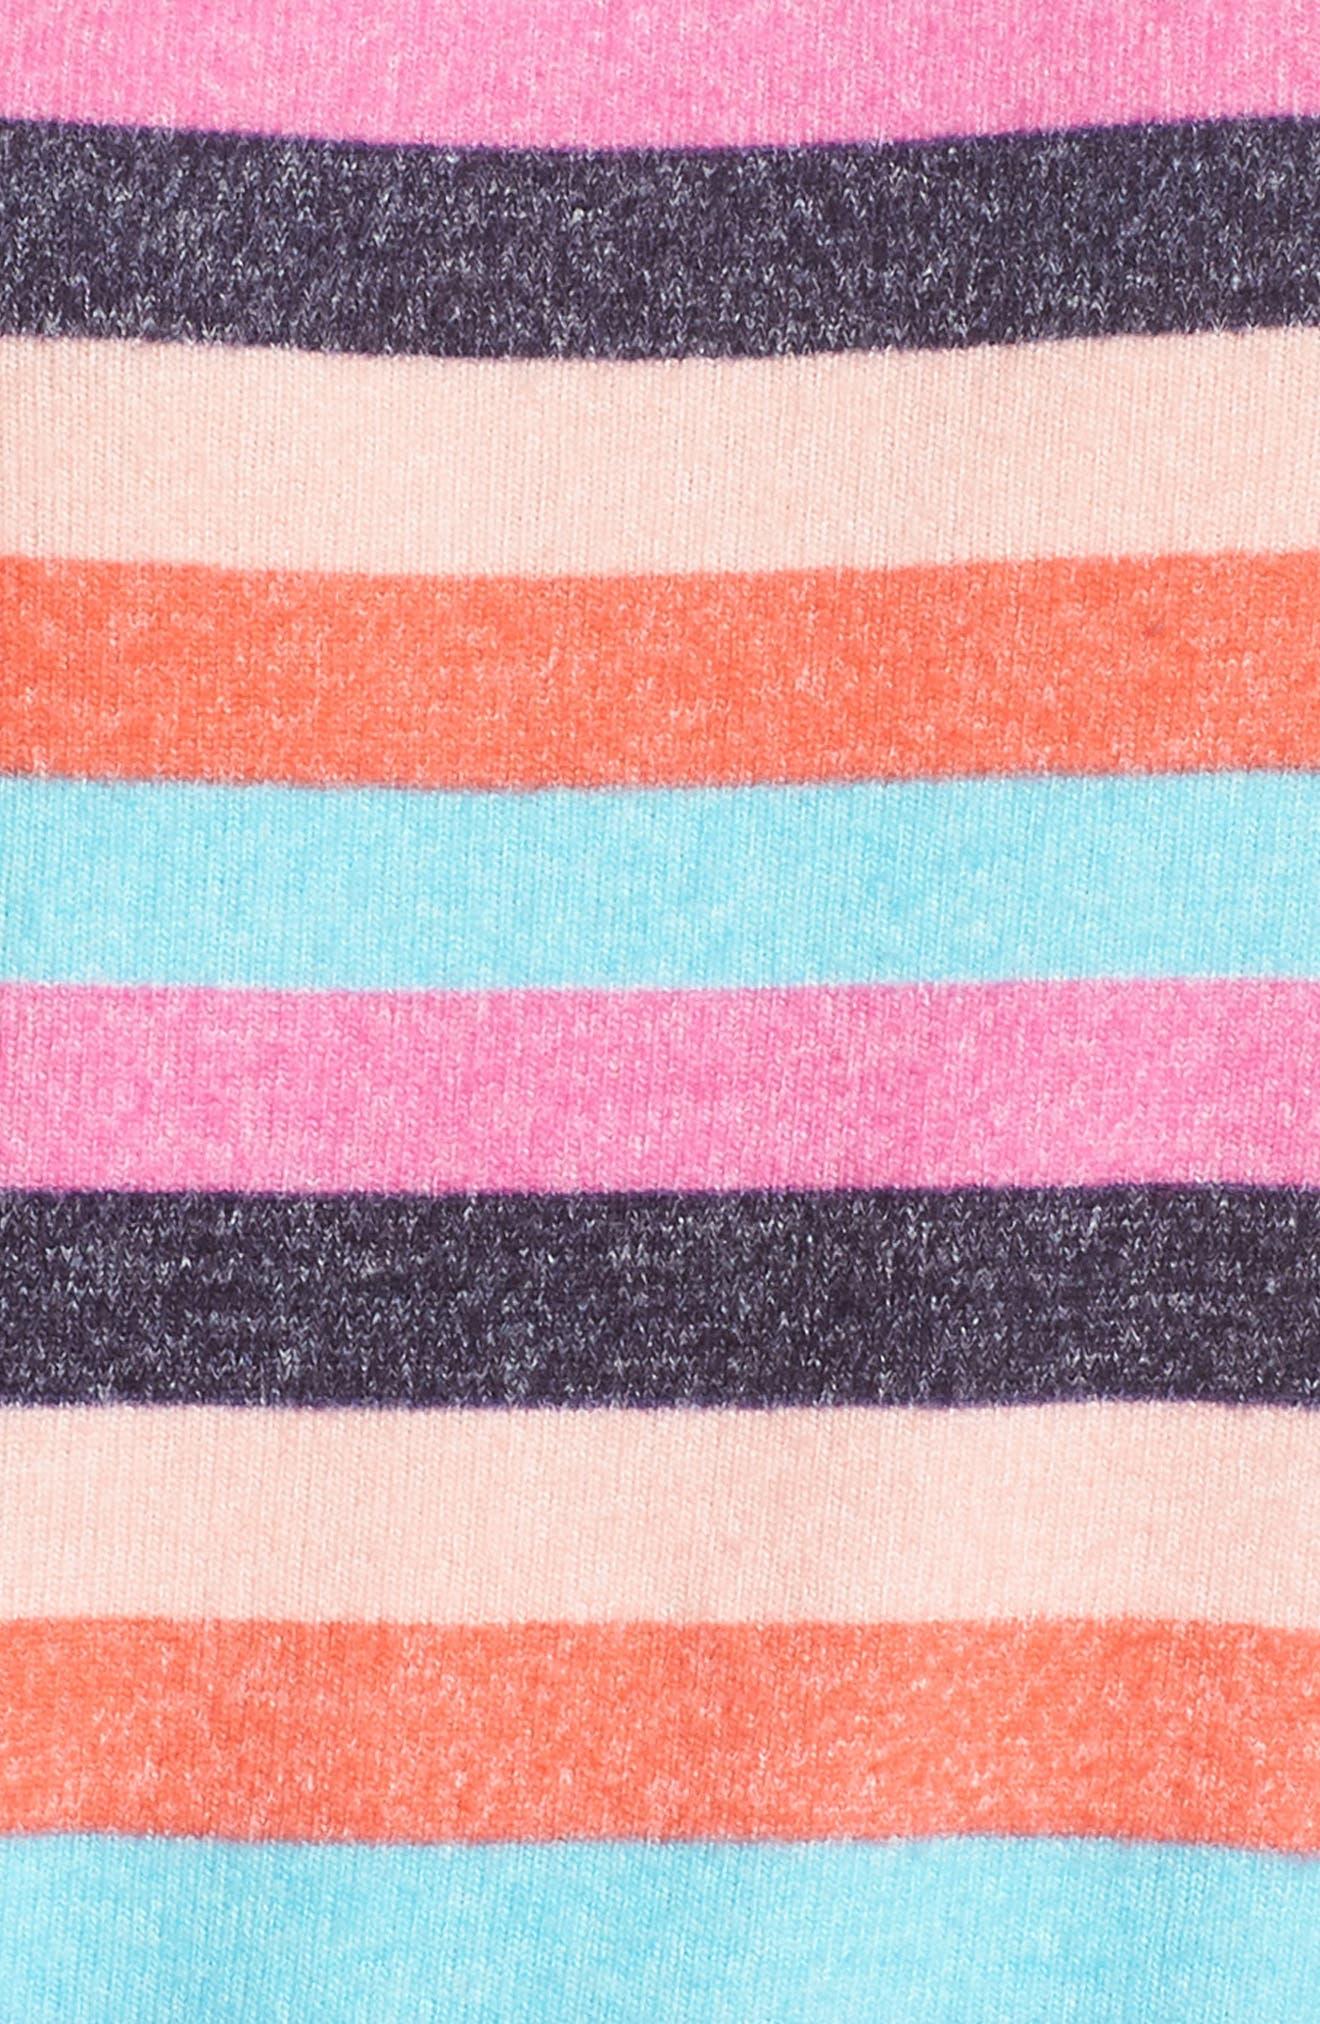 Cozy Crew Raglan Sweatshirt,                             Alternate thumbnail 5, color,                             Navy Dusk Milli Multi Stripe